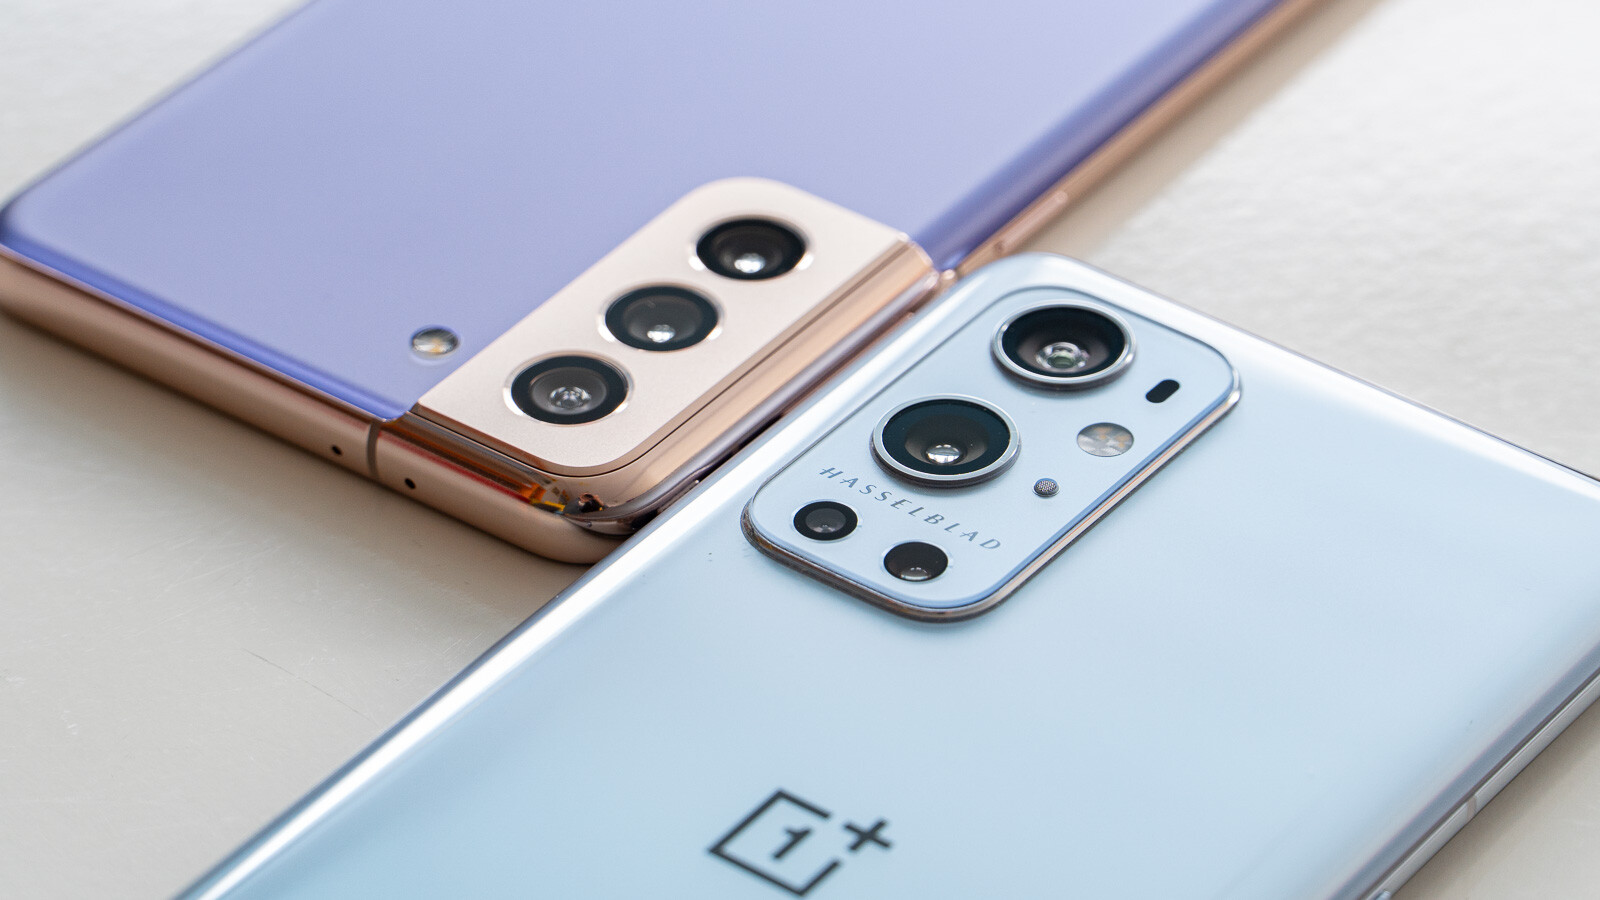 Samsung Galaxy S21 Plus vs OnePlus 9 Pro